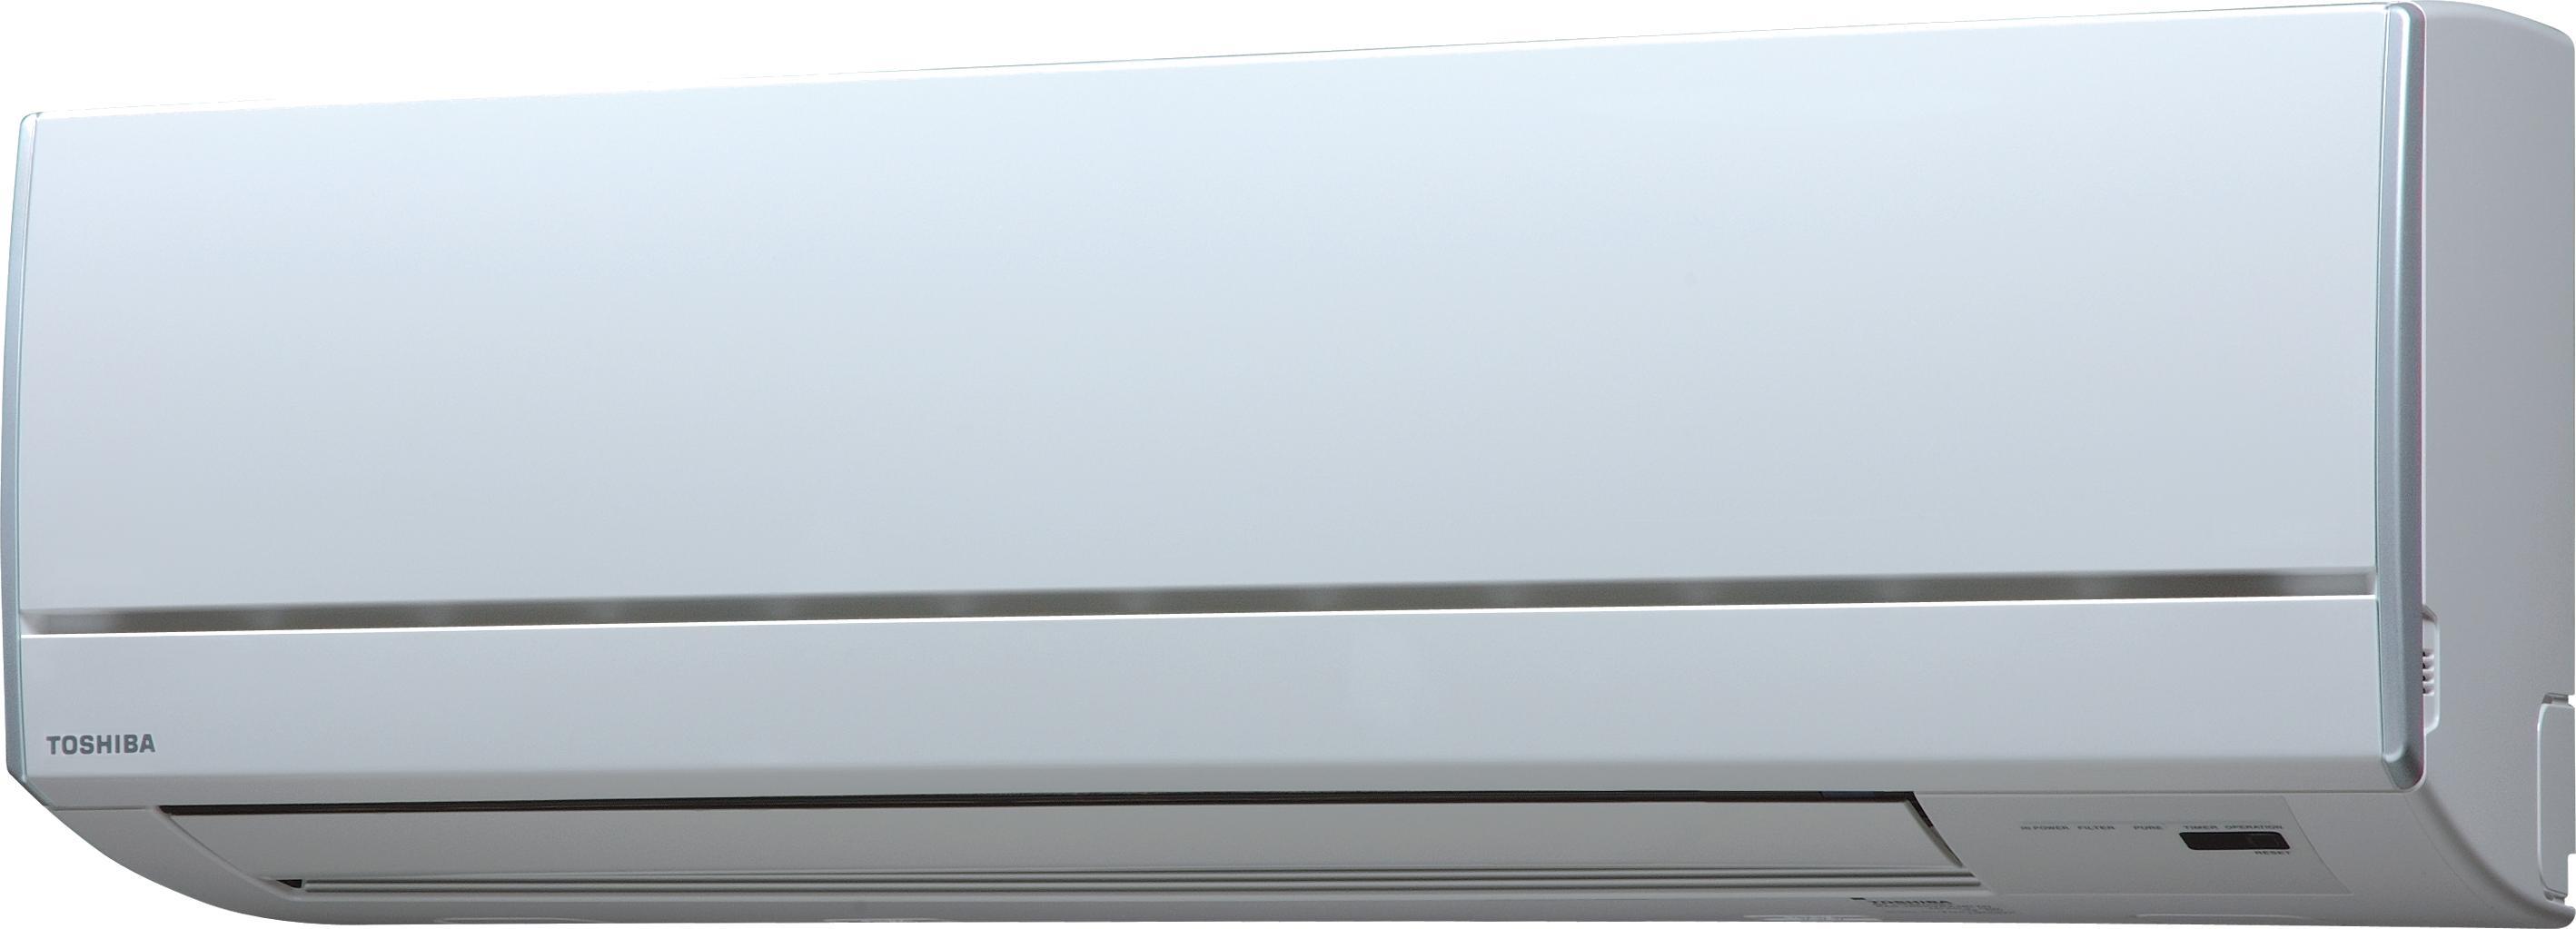 Toshiba RAS-13S2AH-ES